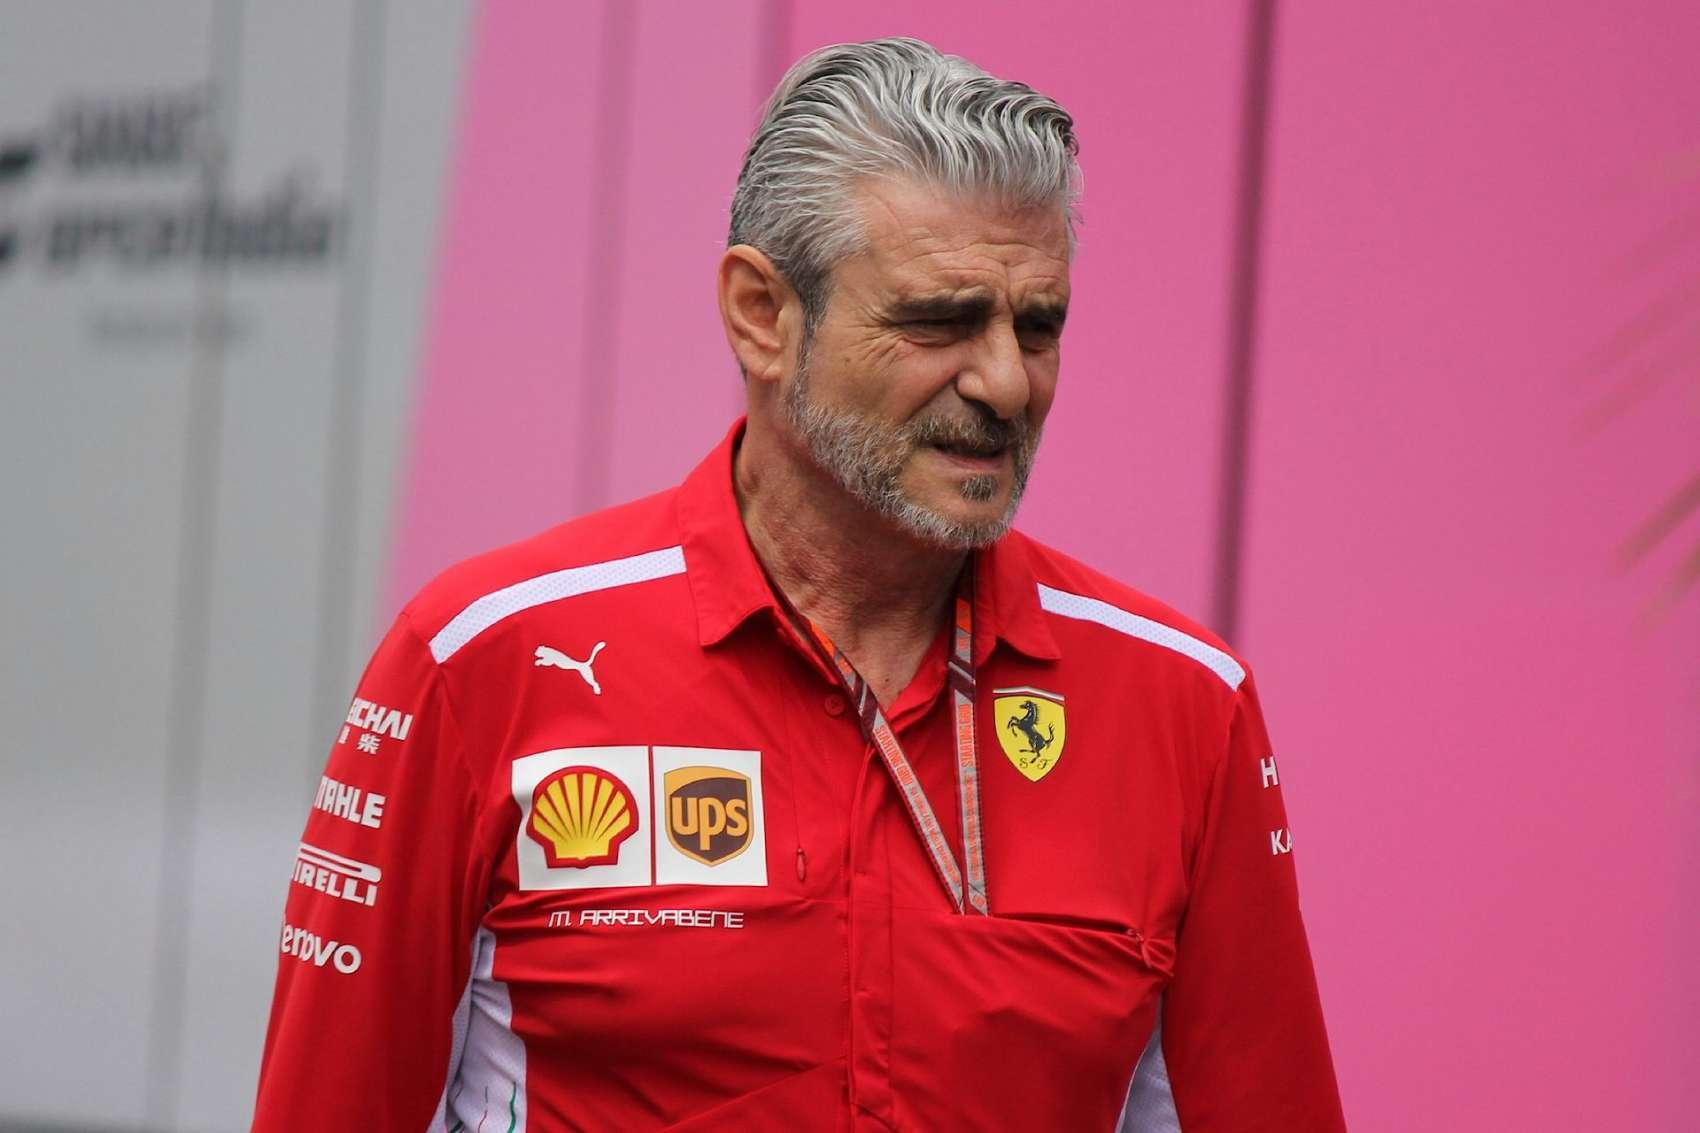 Maurizio Arrivabene, racingline, racinglinehu, racingline.hu